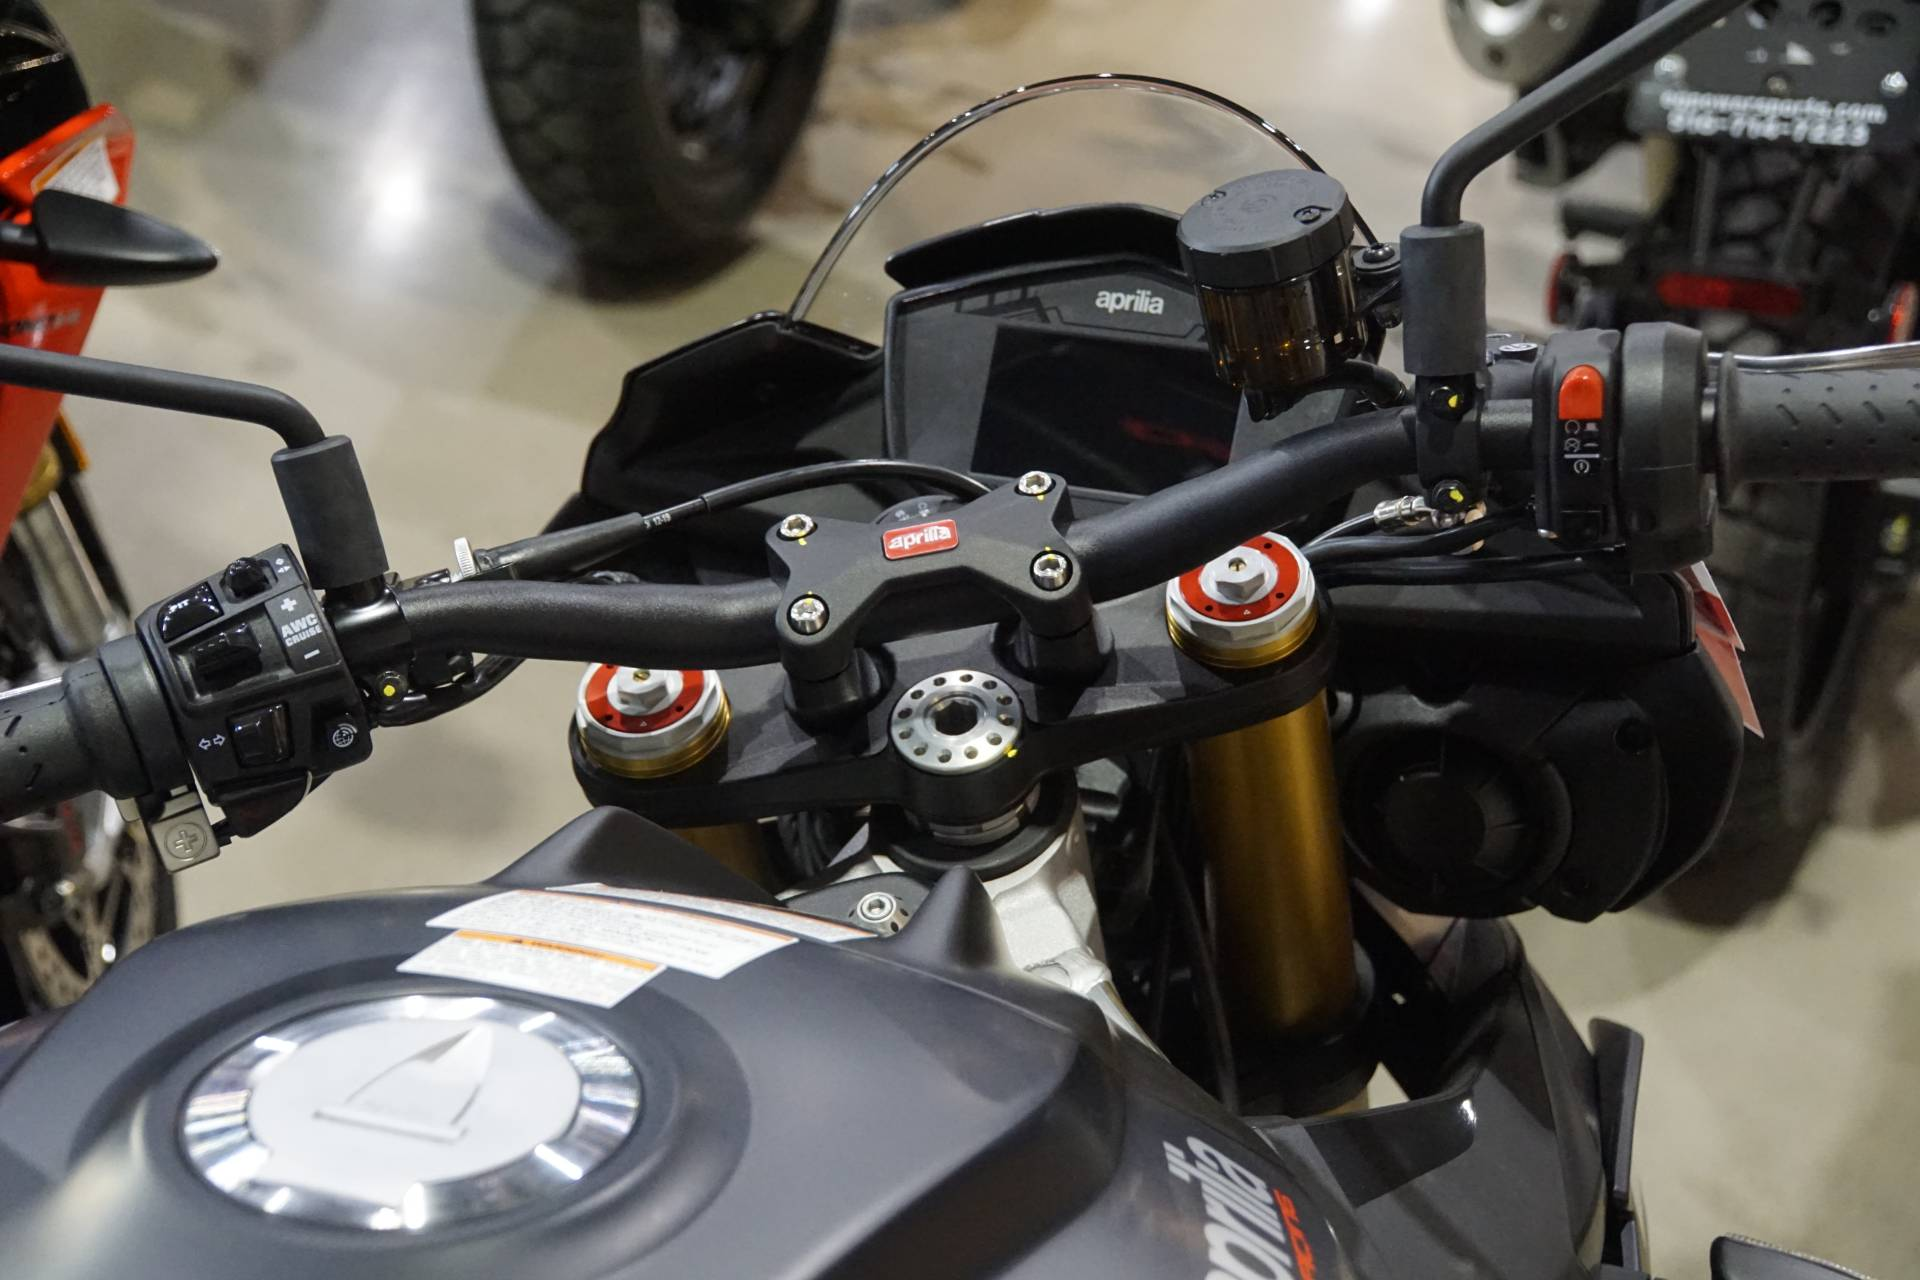 New 2020 Aprilia Tuono V4 1100 Rr Abs Motorcycles In Elk Grove Ca Stock Number Apr001238